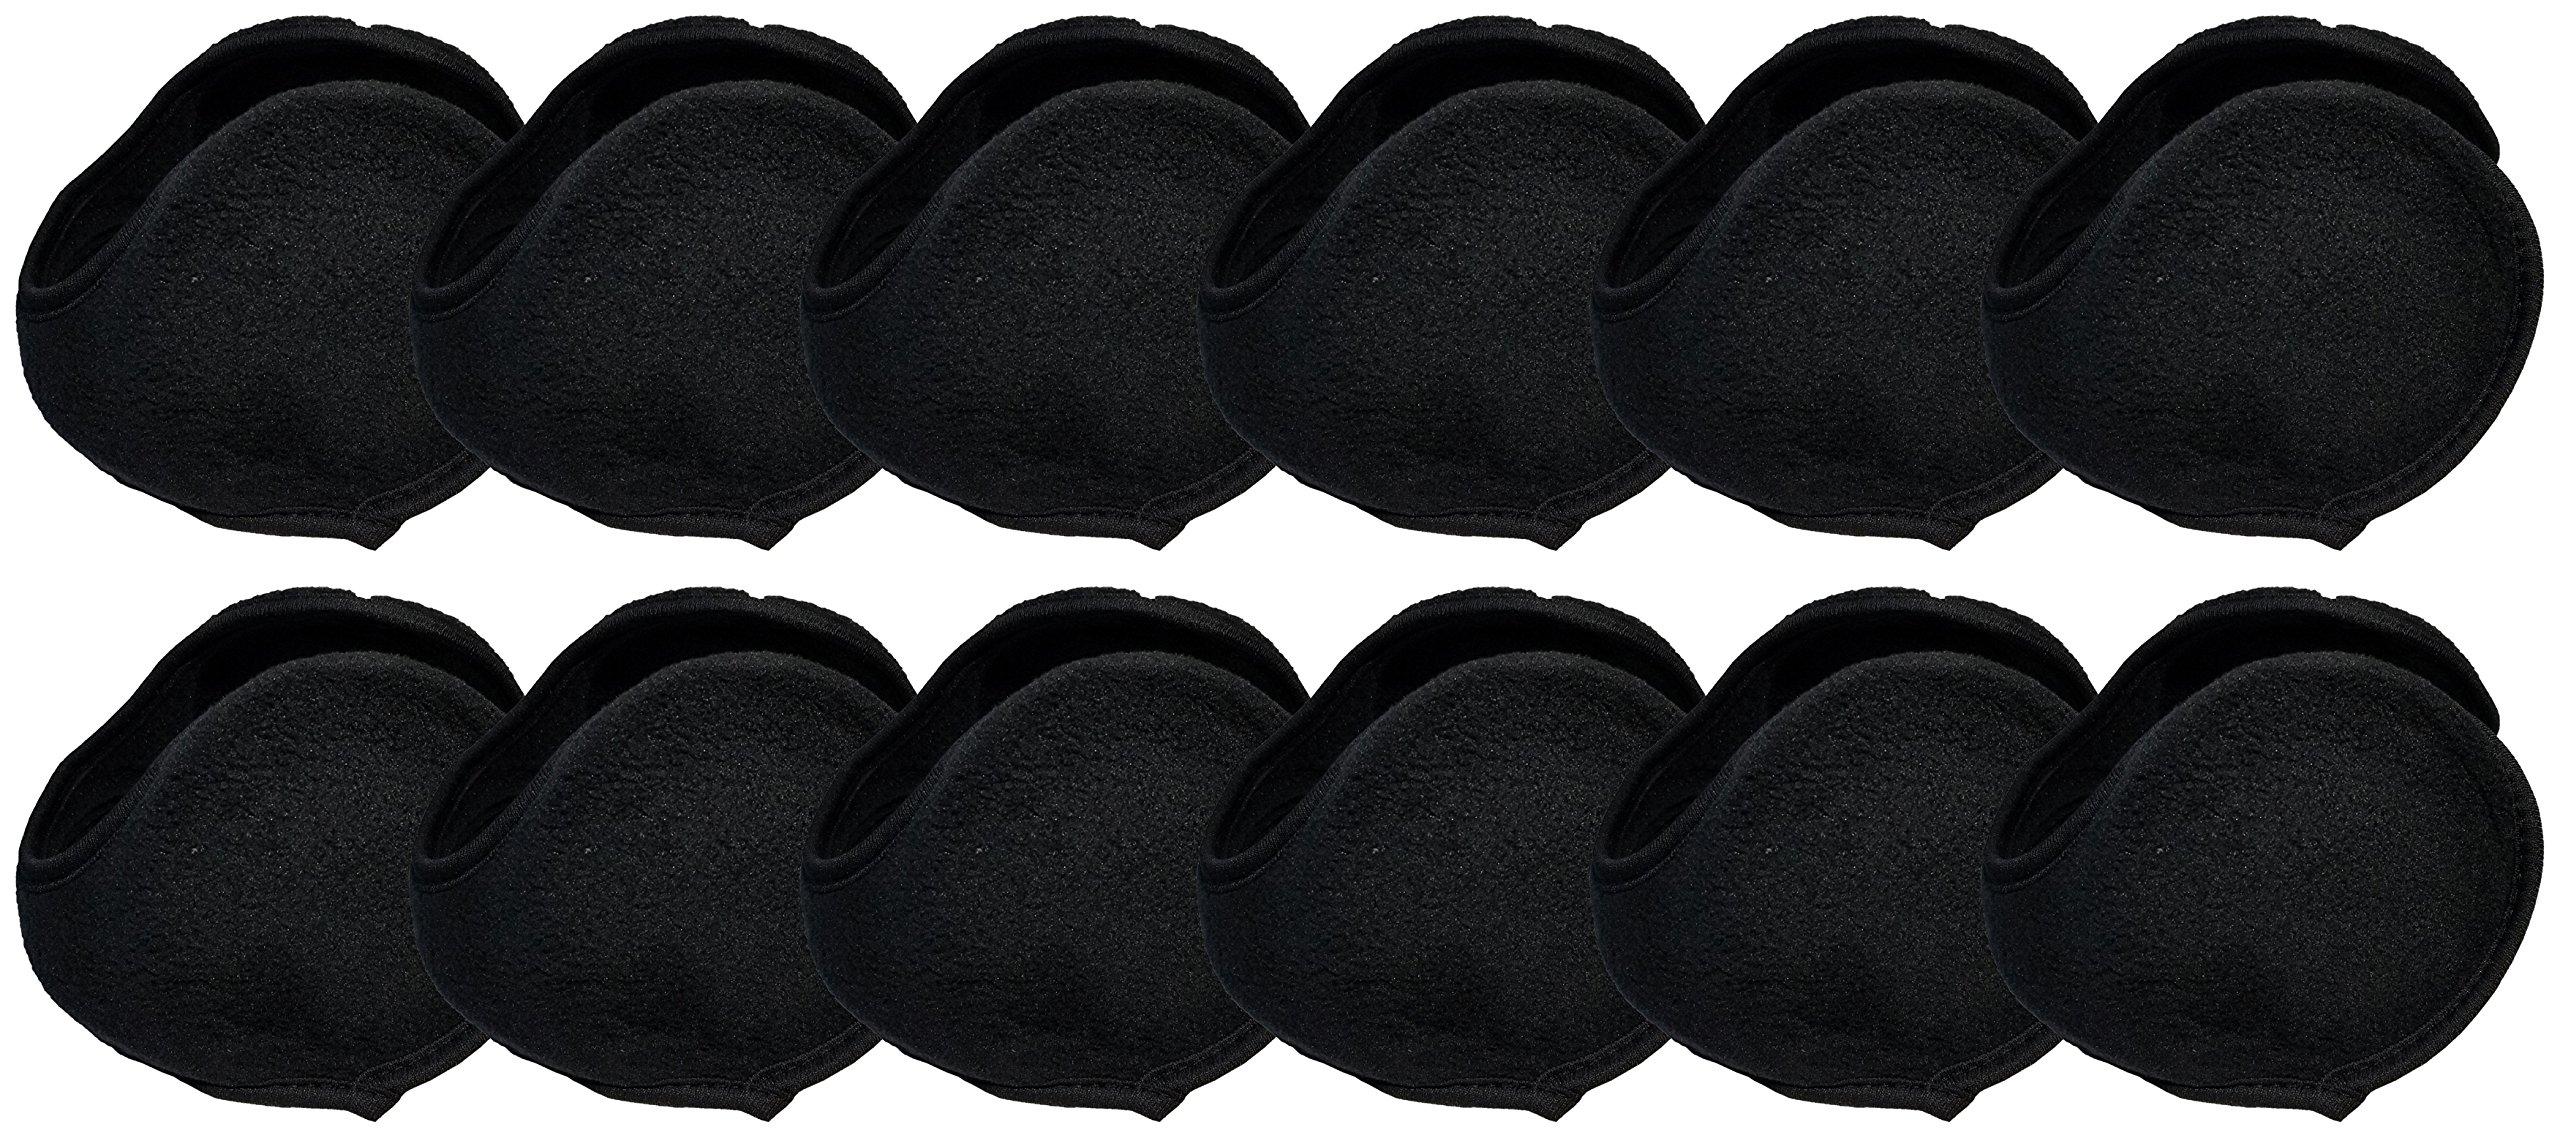 Winter Earmuffs, 12 Pack, Cozy Ear Warmers Colors Mens Womens Unisex Bulk Assorted Ear Muff (12 Pack - Black Ear Wrap)